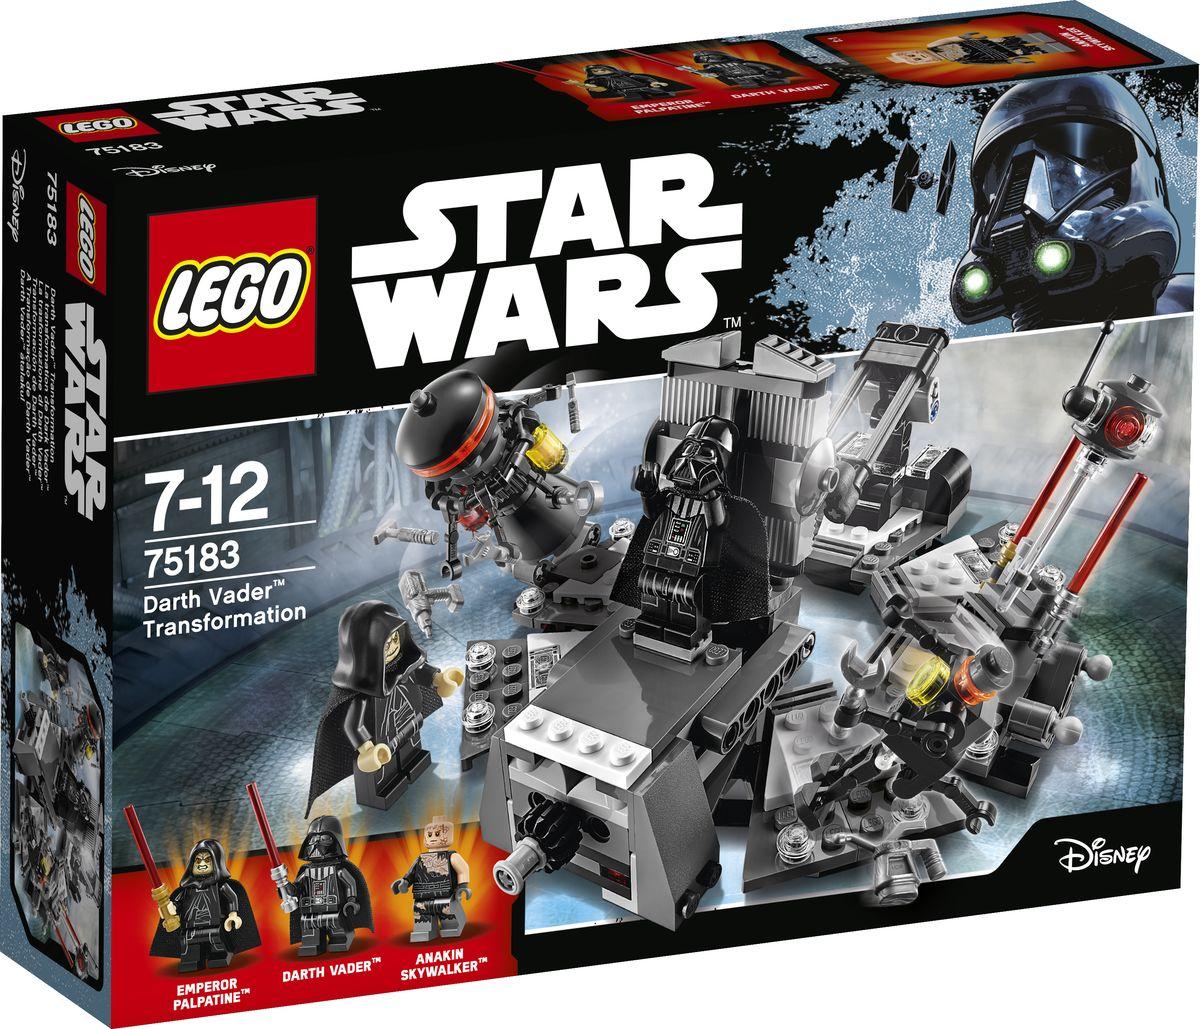 LEGO Star Wars Конструктор Превращение в Дарта Вейдера 75183 lego конструктор сид дарта вейдера против a wing star wars 75150